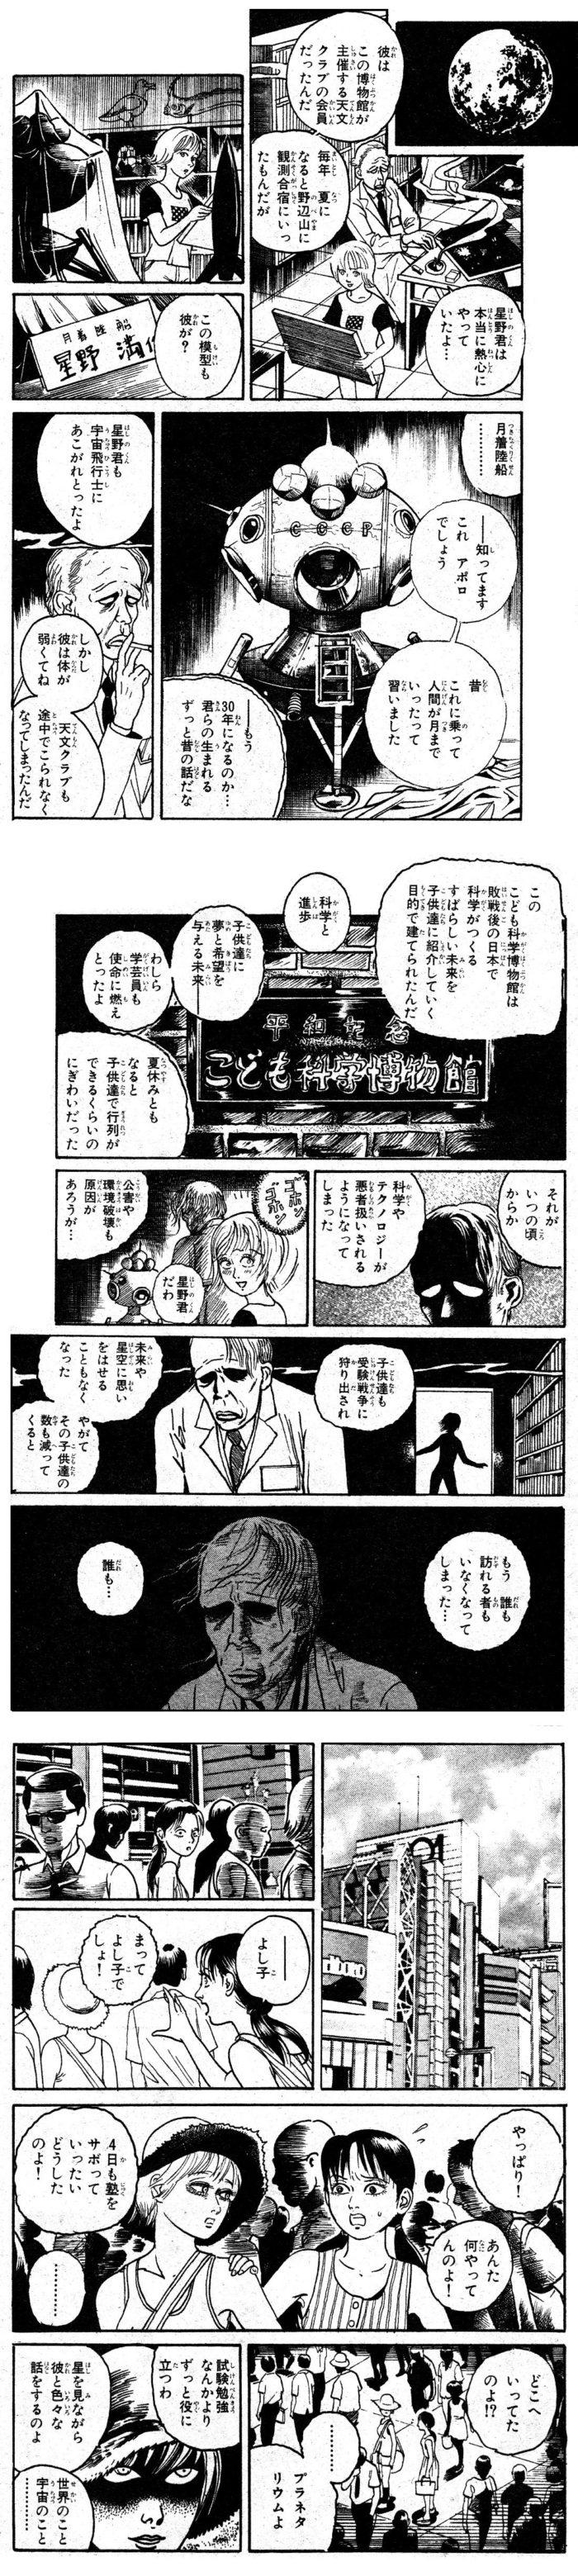 yozorani04